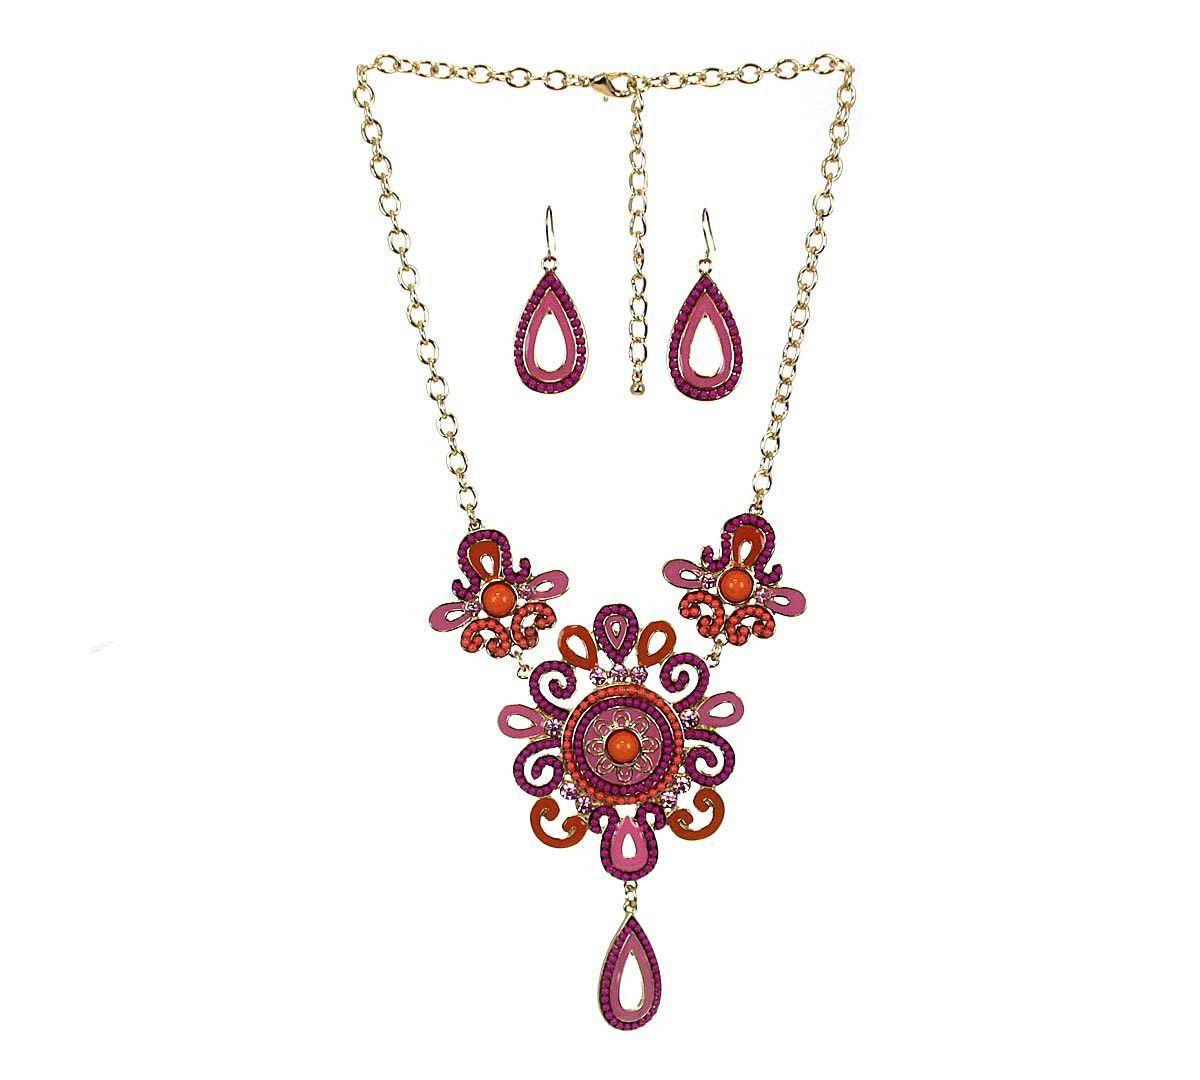 Bib necklace u earring set coral bibs